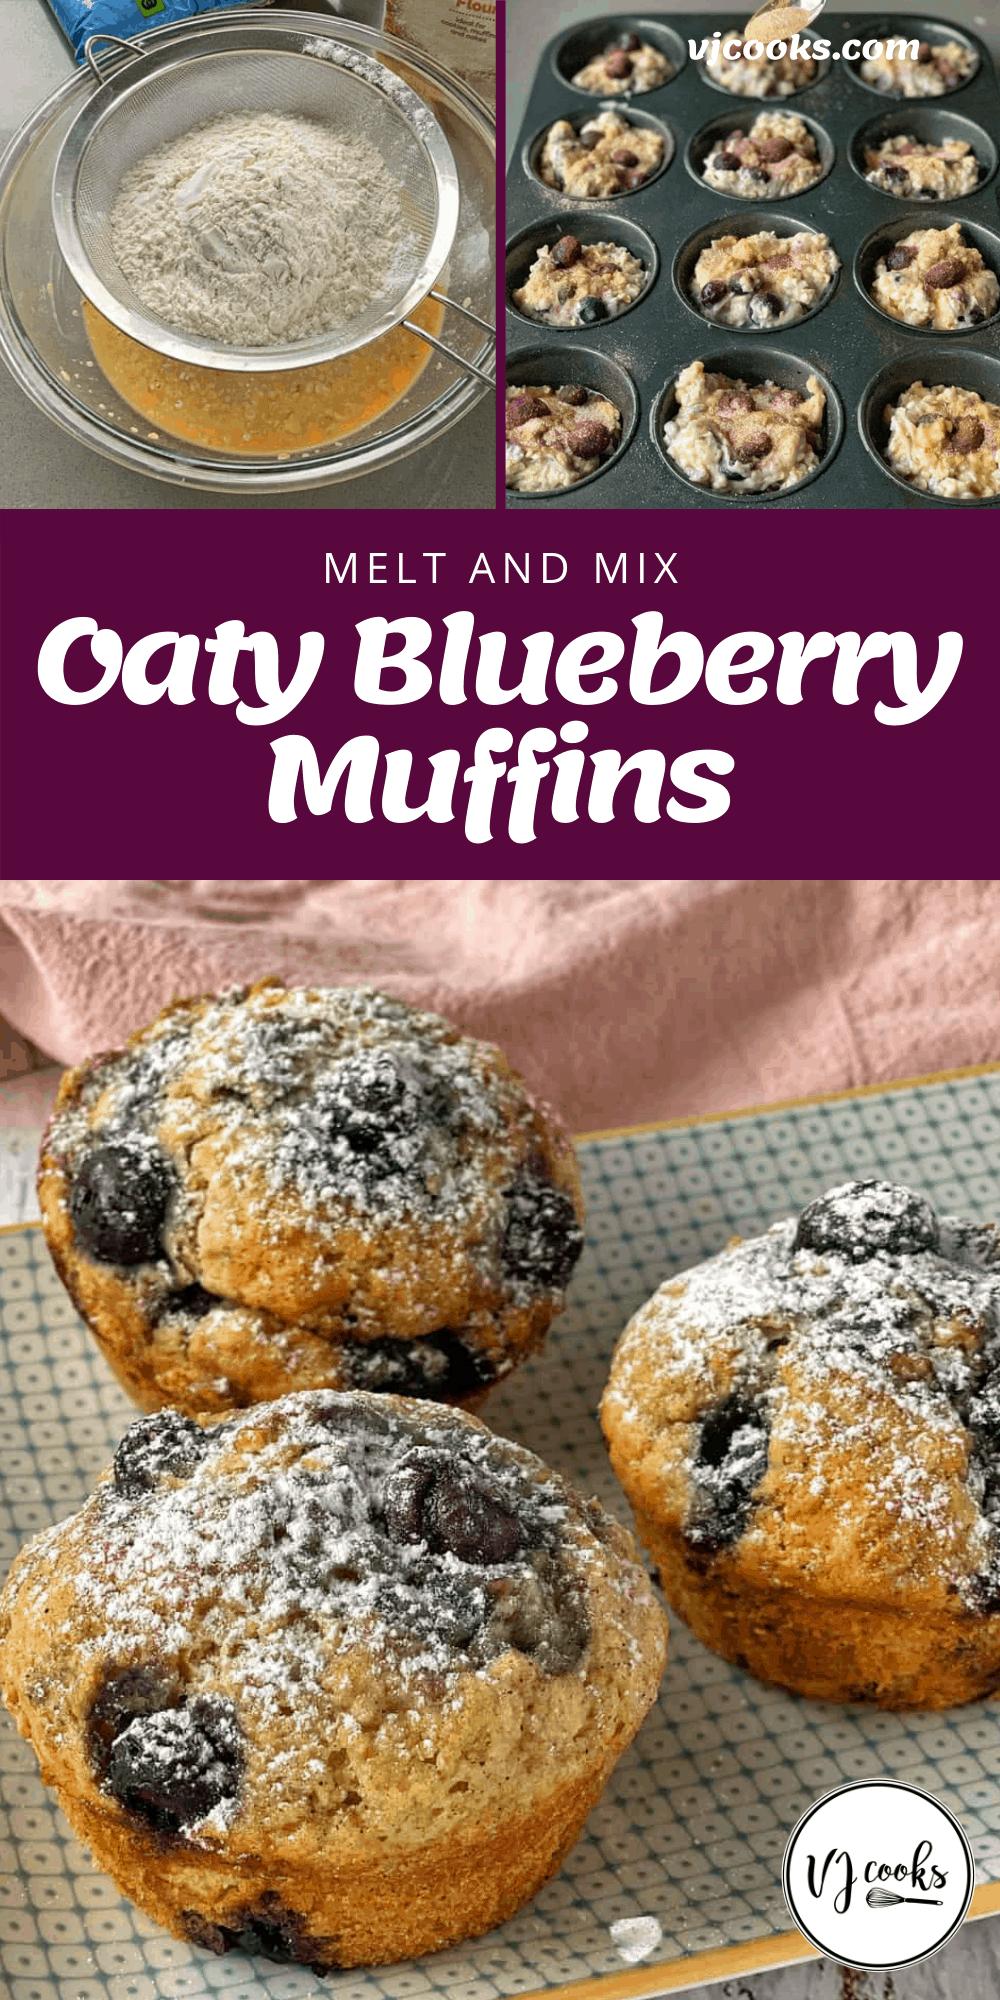 oaty blueberry muffins